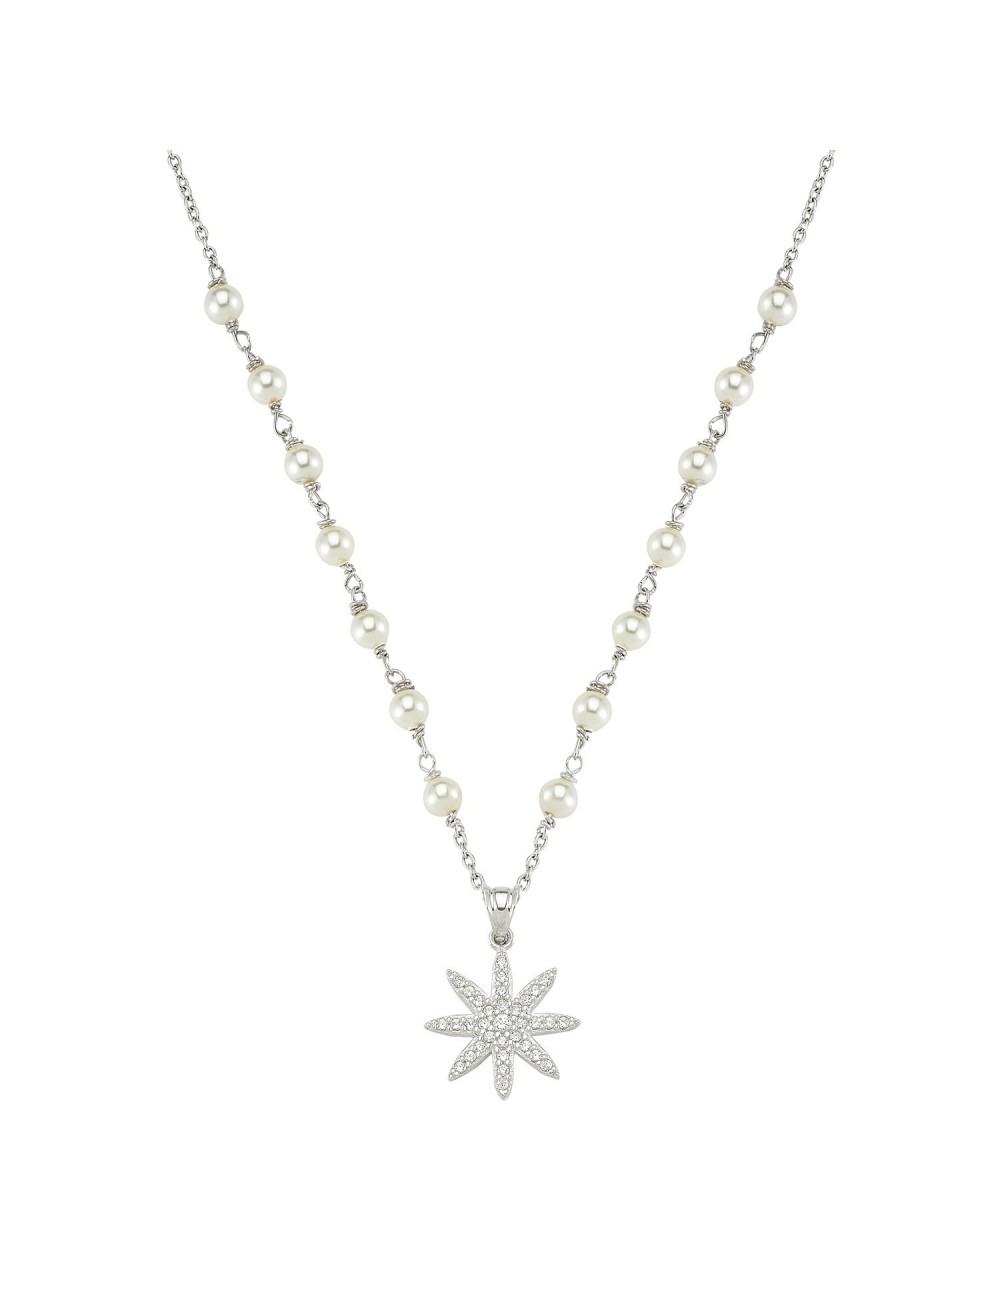 Collier de perles swarovski